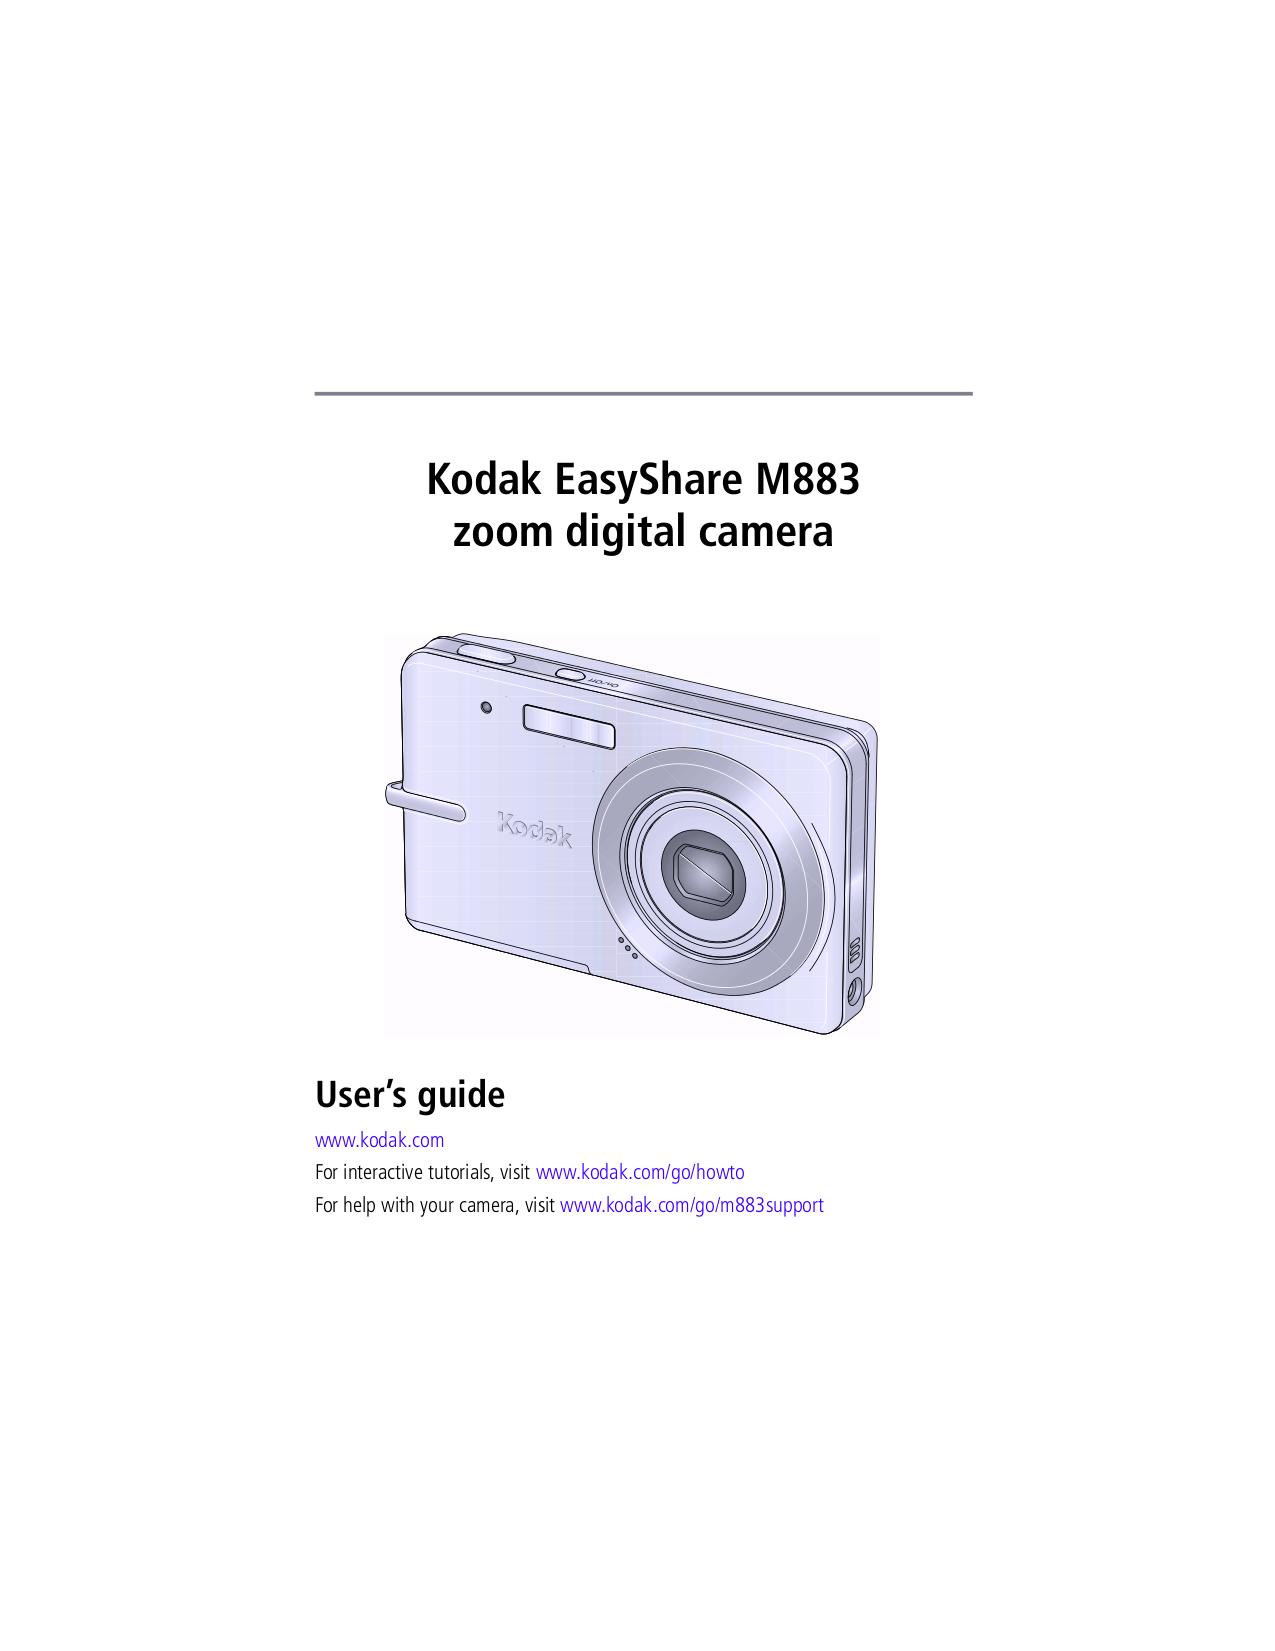 Manual fotografie digitala pdf 73